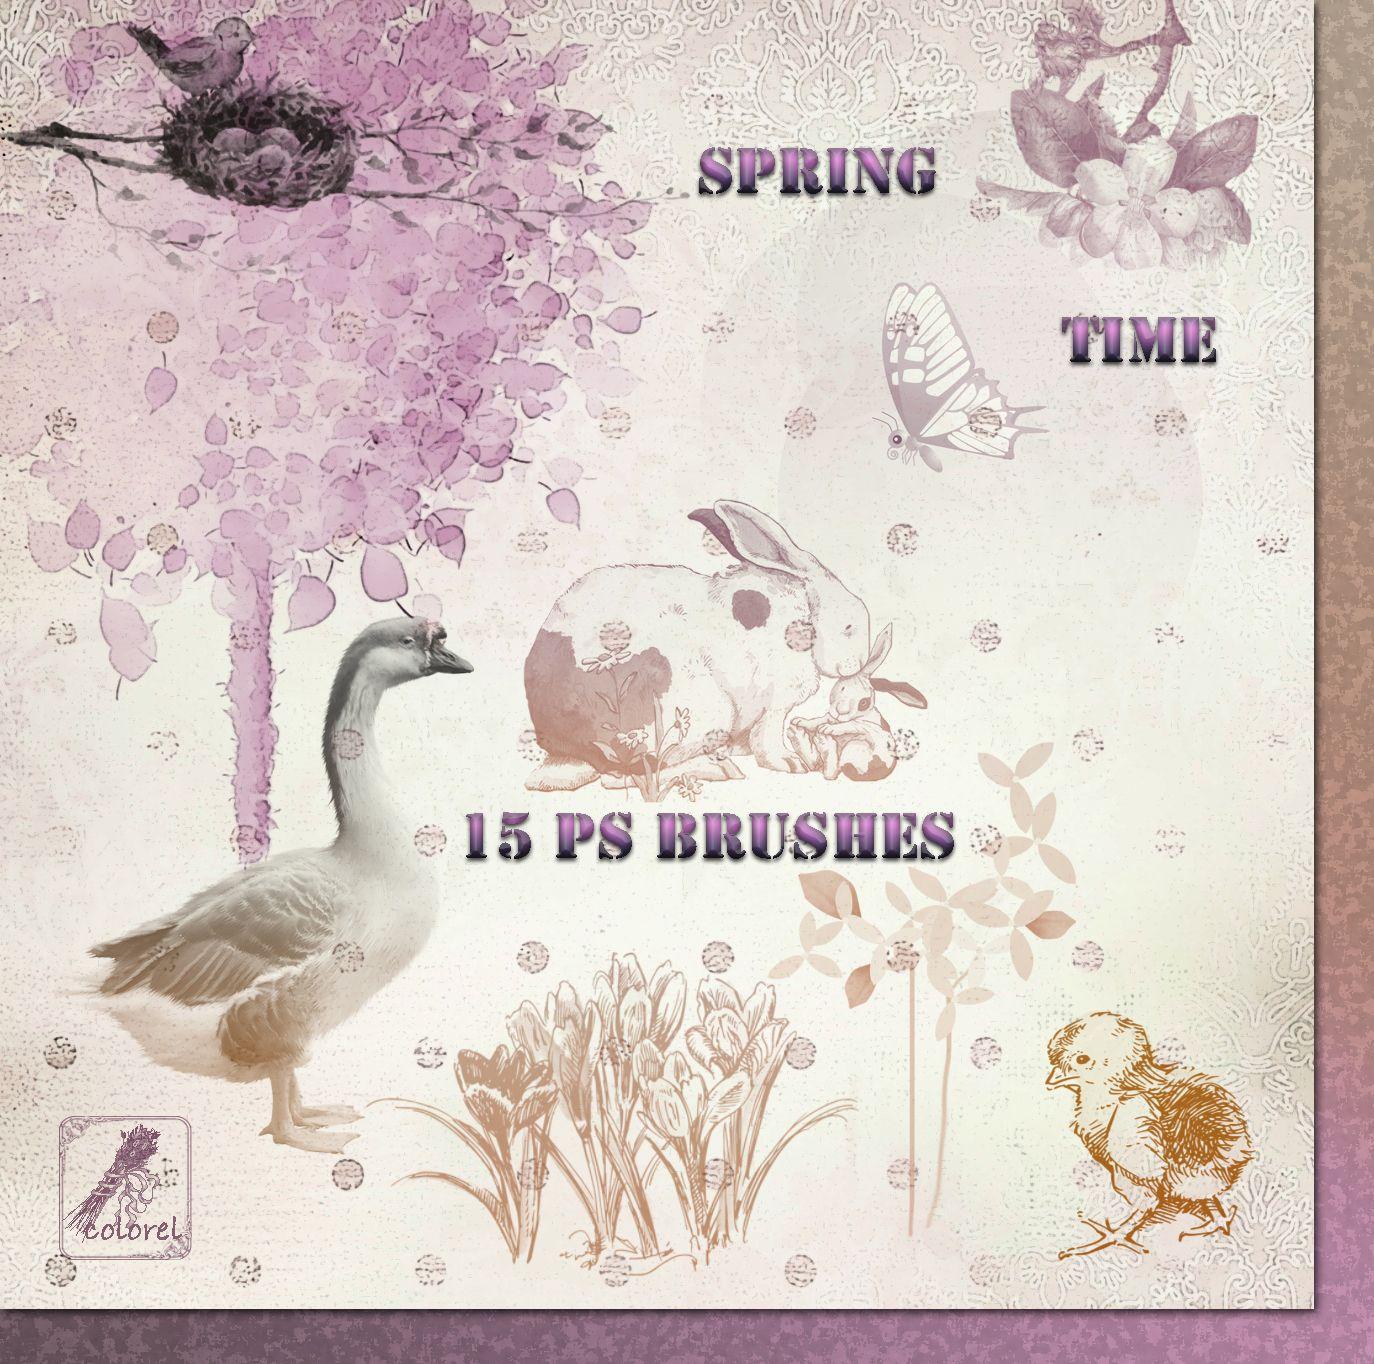 Colorel-ressources: Spring Time